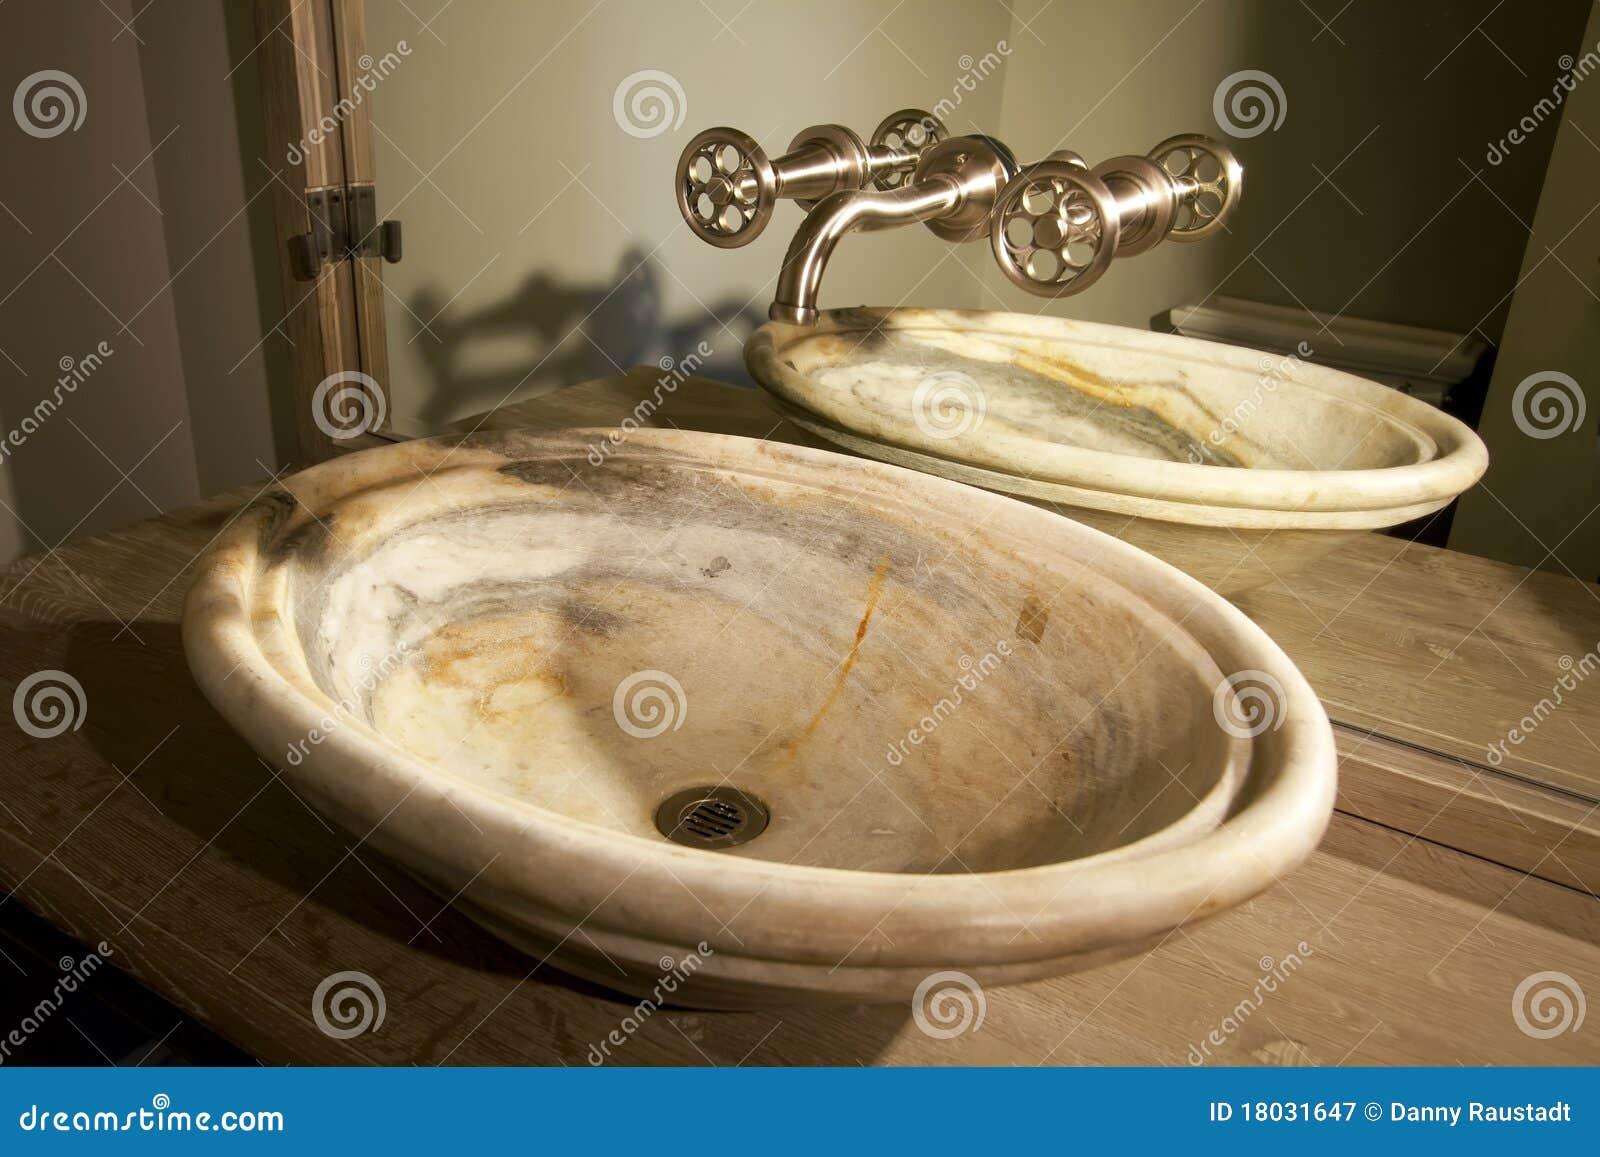 unique modern home interior bathroom royalty free stock